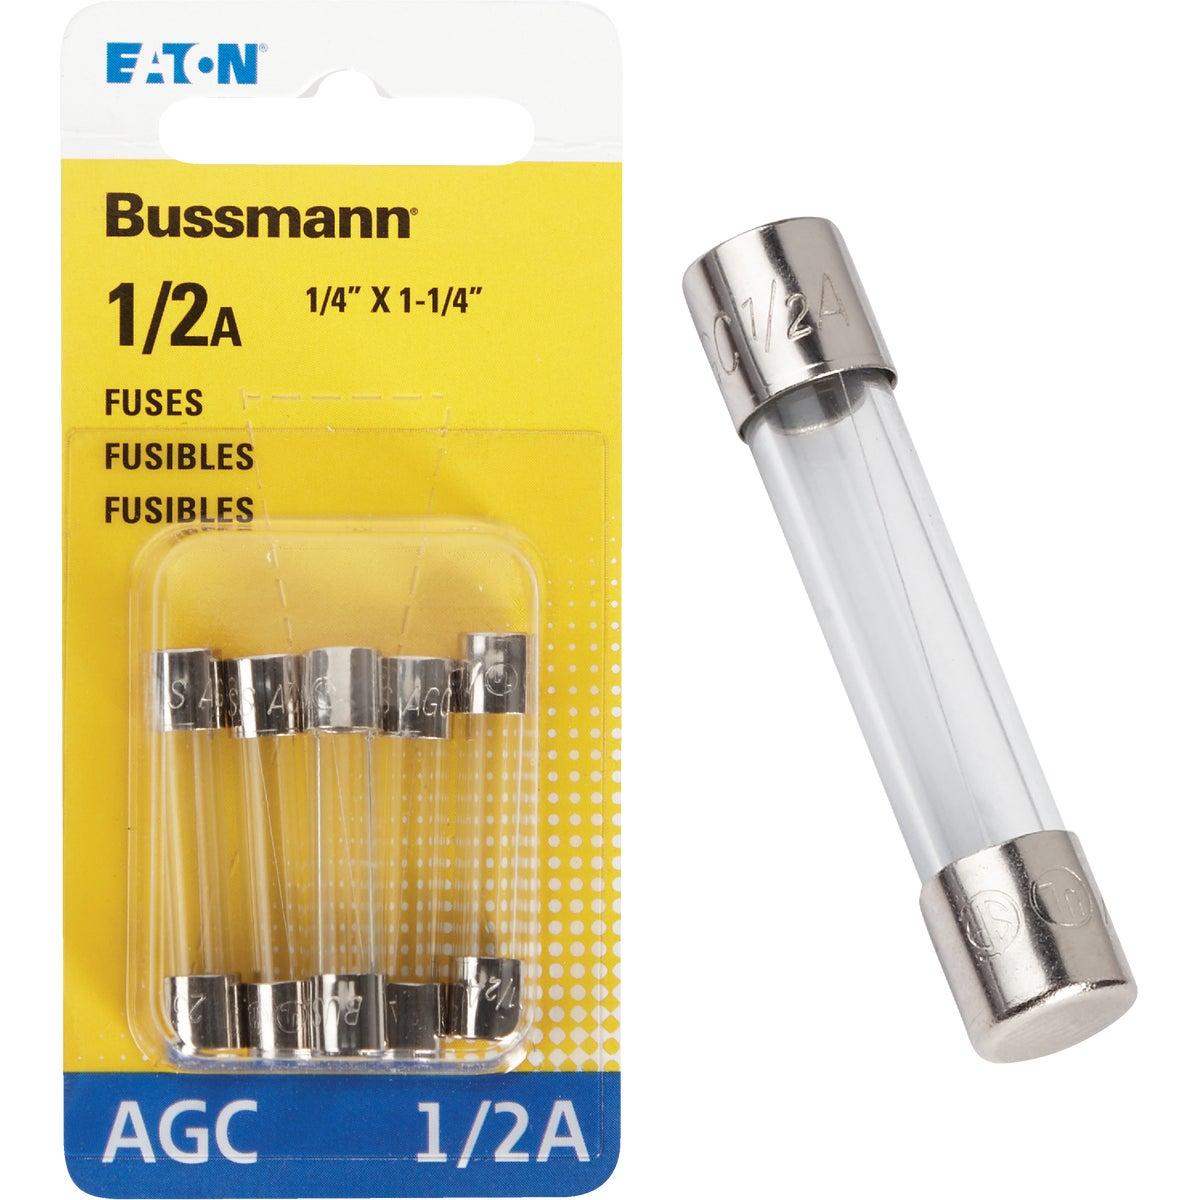 1/2 AMP FUSE - BP/AGC-1-2-RP by Bussmann Cooper